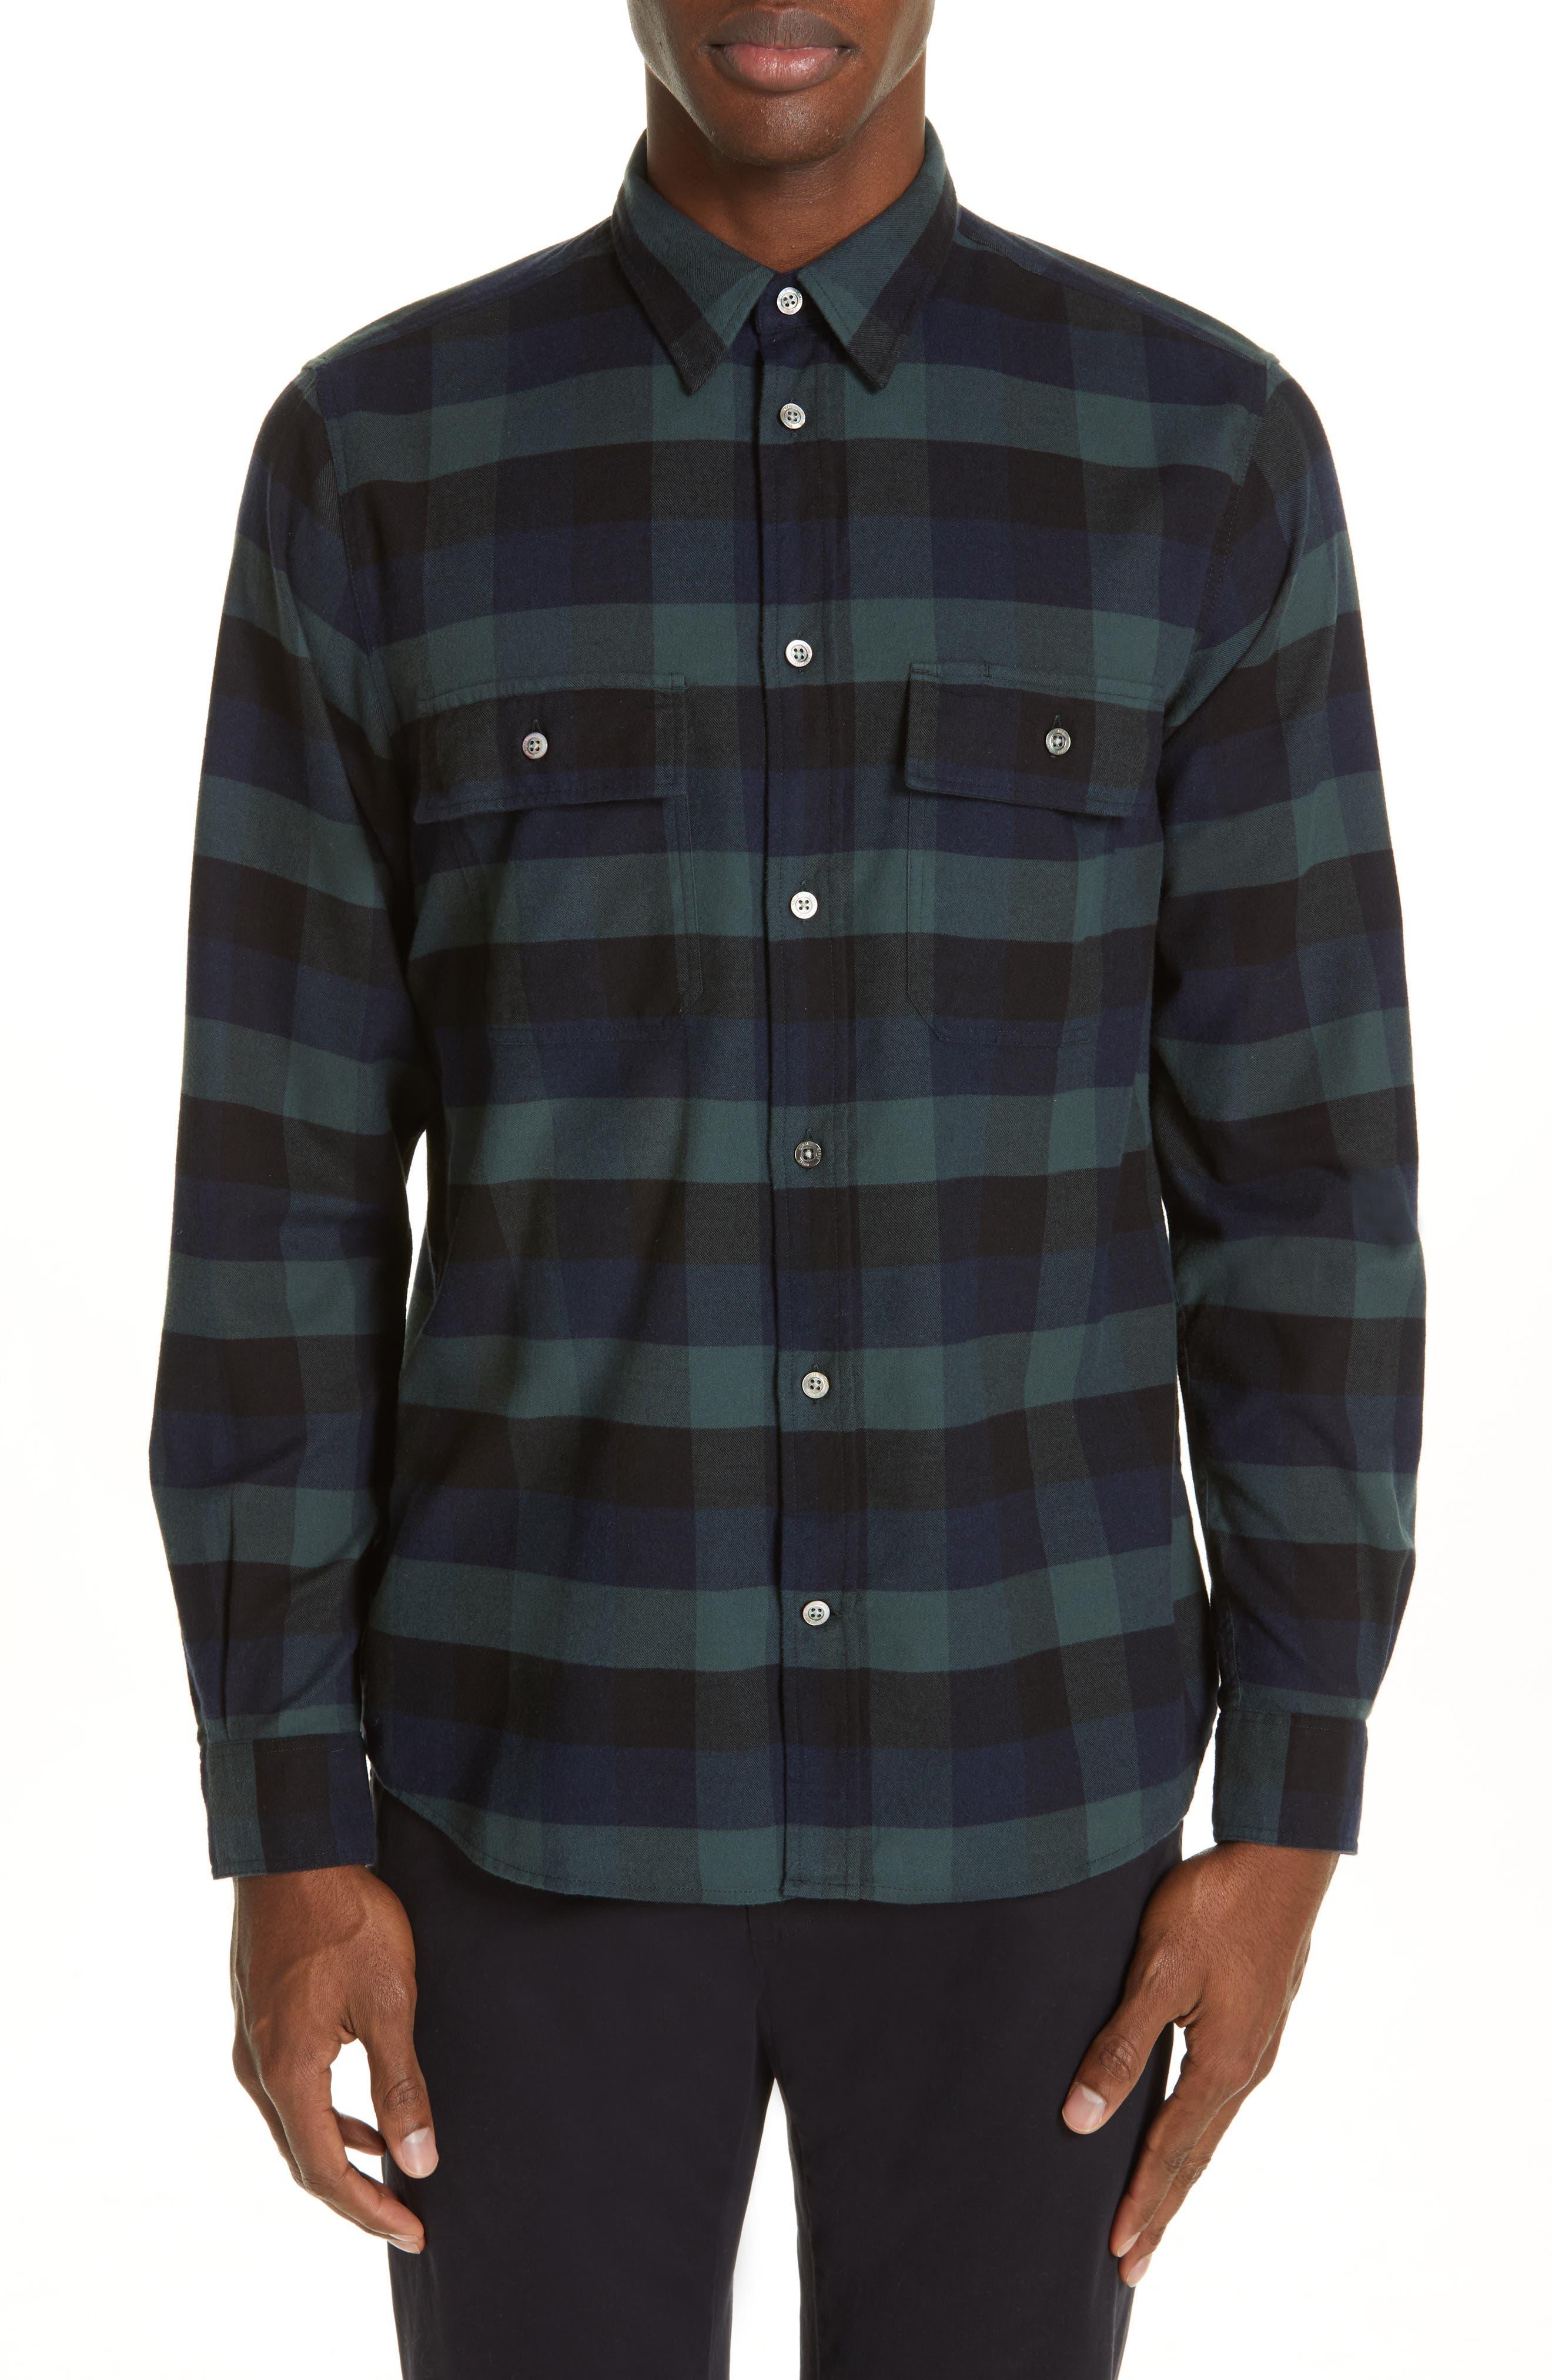 Villads Check Brushed Flannel Shirt,                             Main thumbnail 1, color,                             DARK NAVY